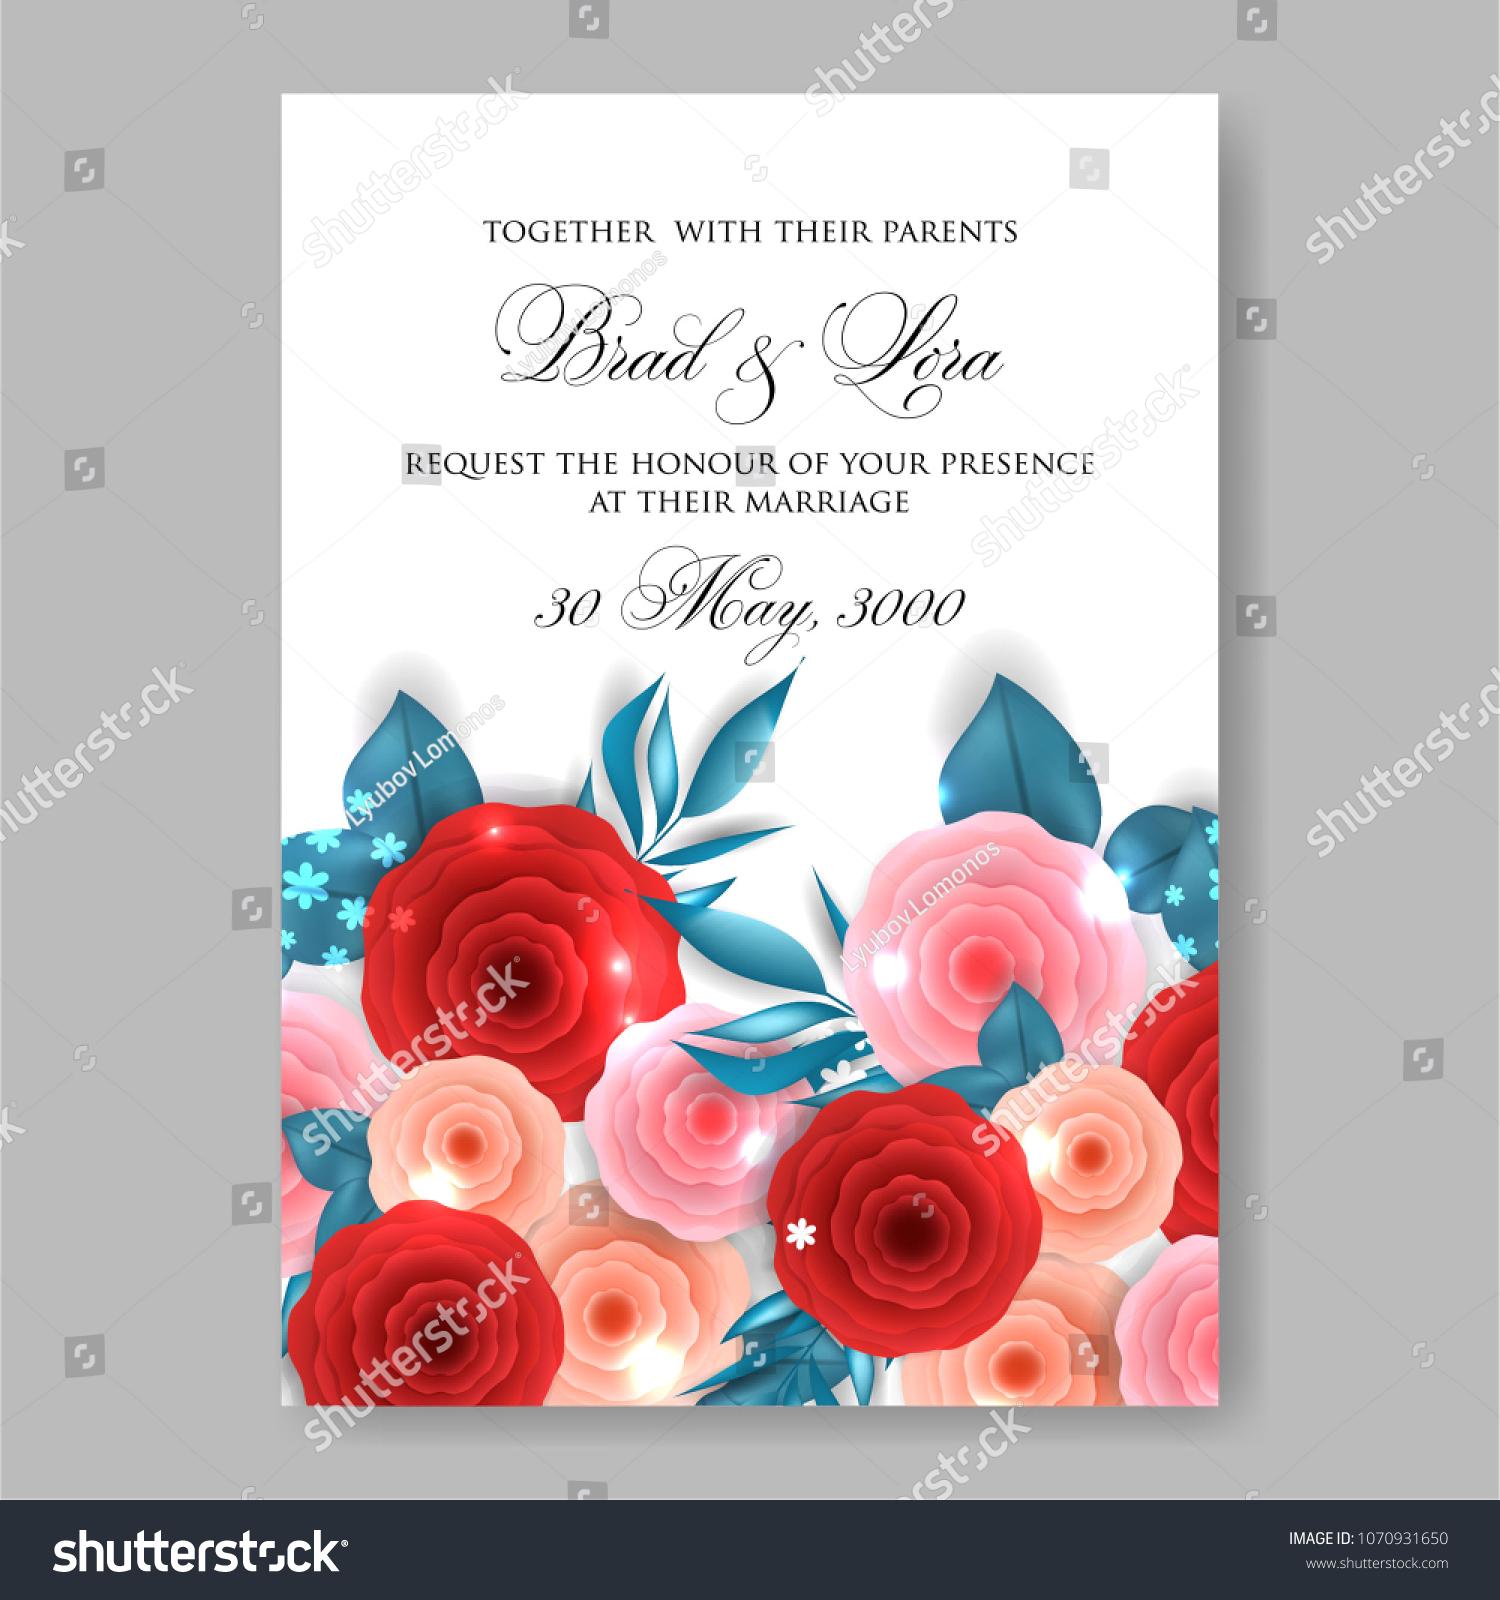 Amazing Beach Theme Wedding Invitations Cheap Images - Invitations ...